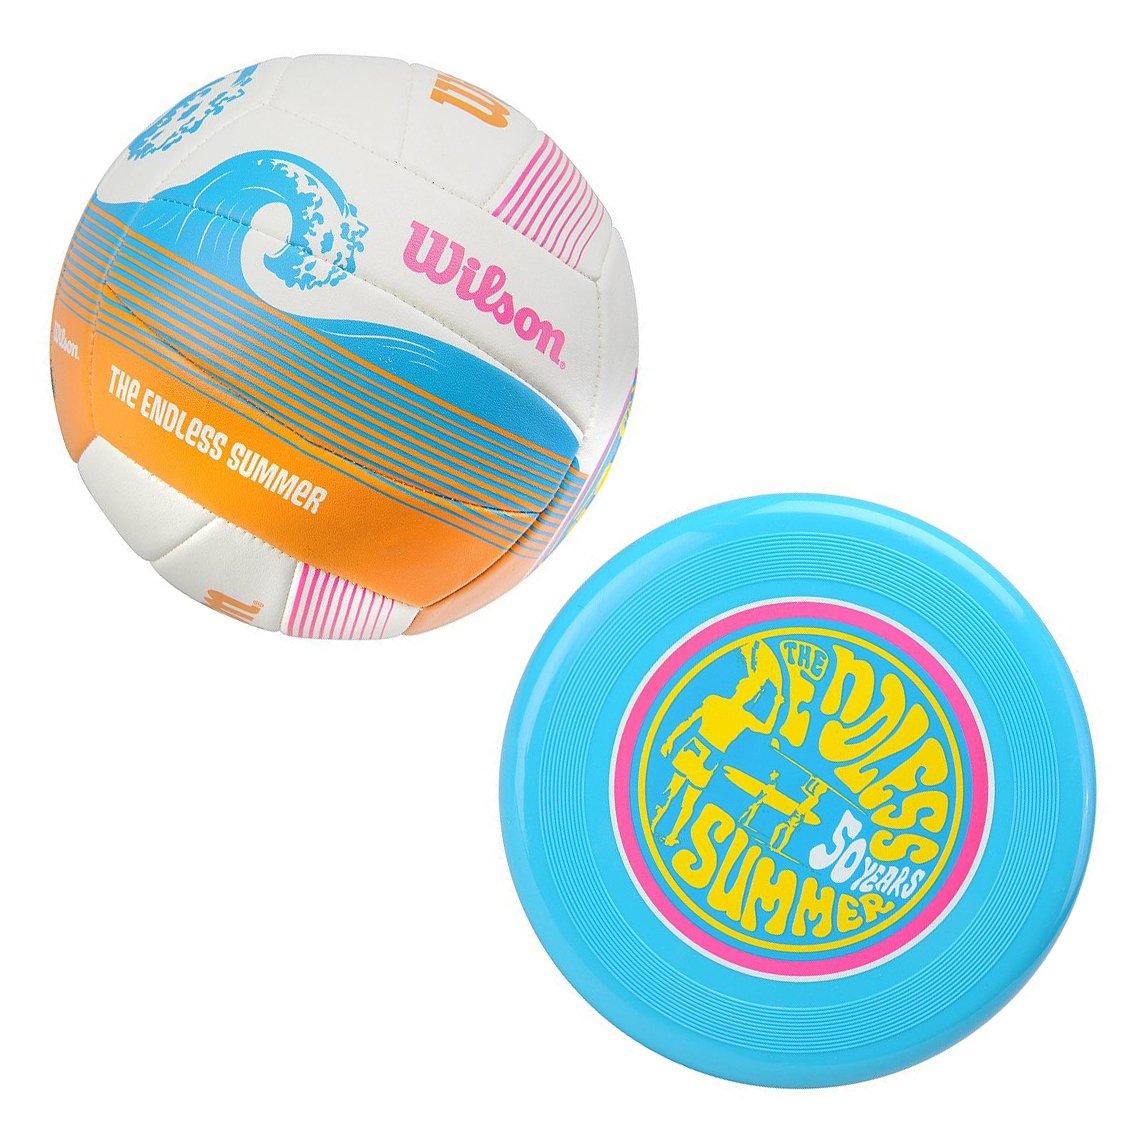 Wilson Endless - Balón de voleibol, tamaño M, color blanco Wilson Teamsport WTX0522 KIT